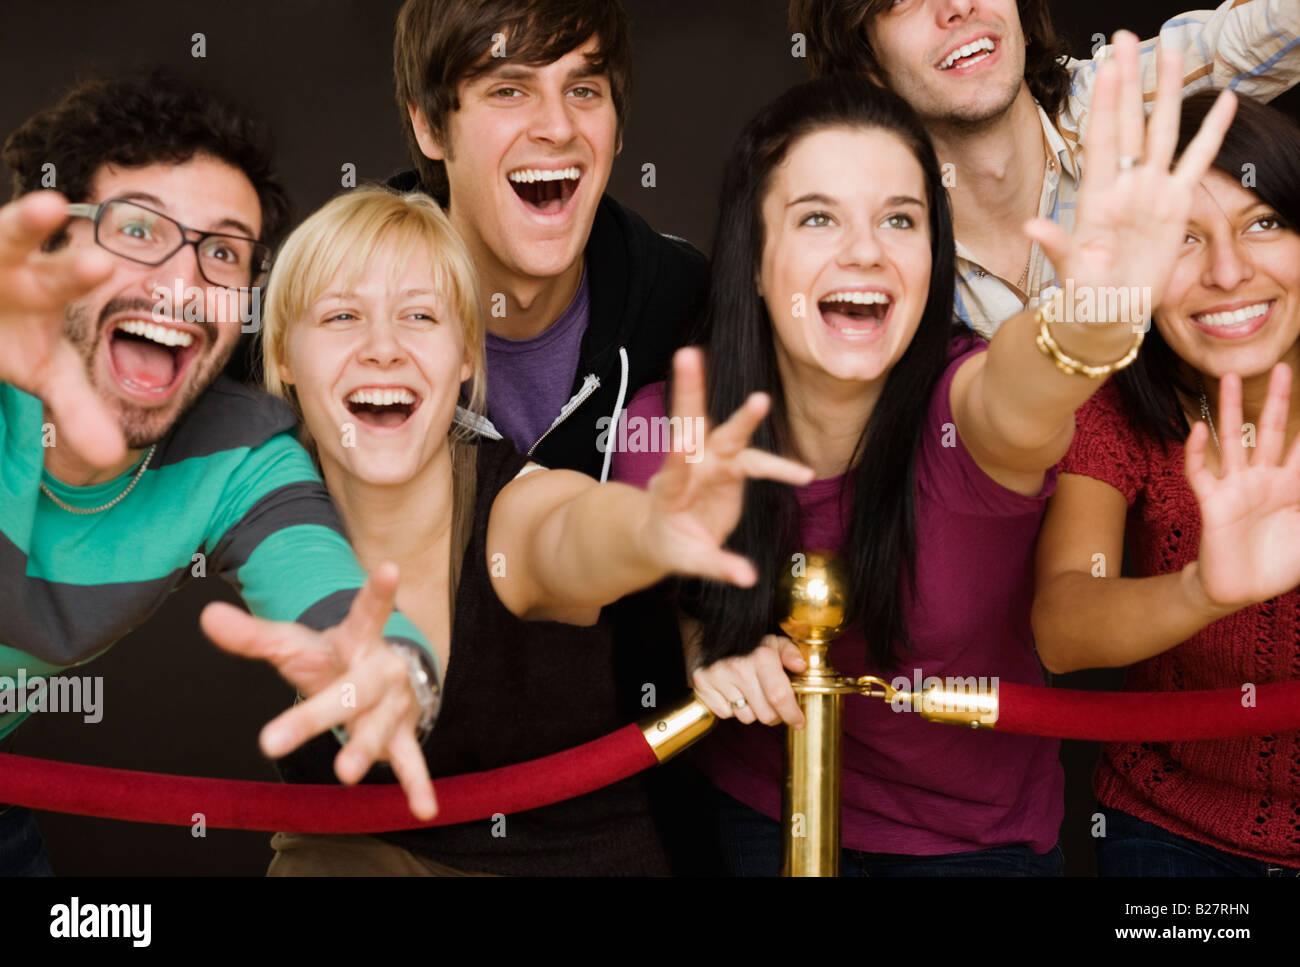 group of people reaching across velvet rope - Stock Image